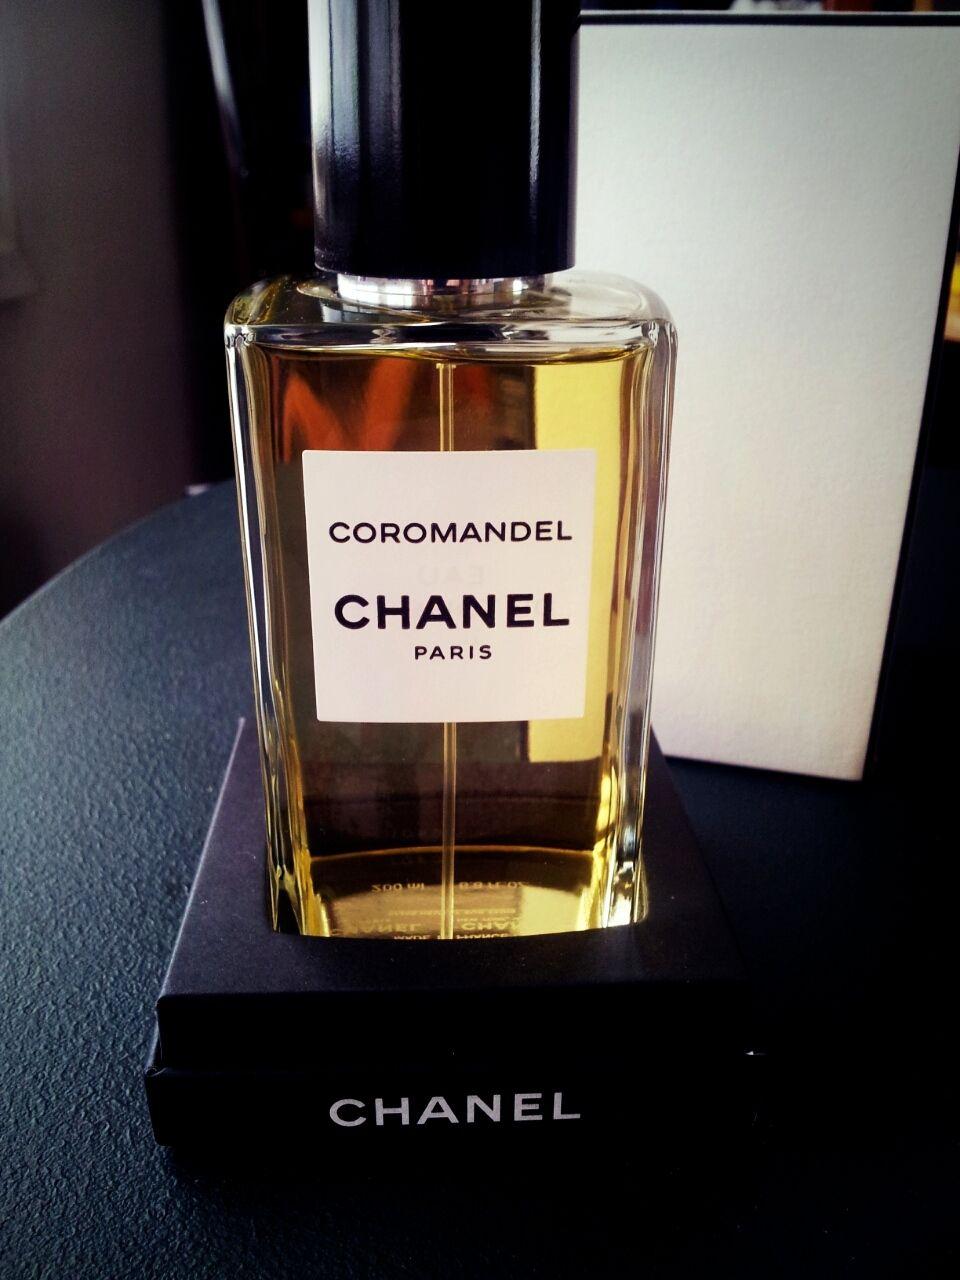 2bb1bd3a049 Les Exclusifs de Chanel - Coromandel